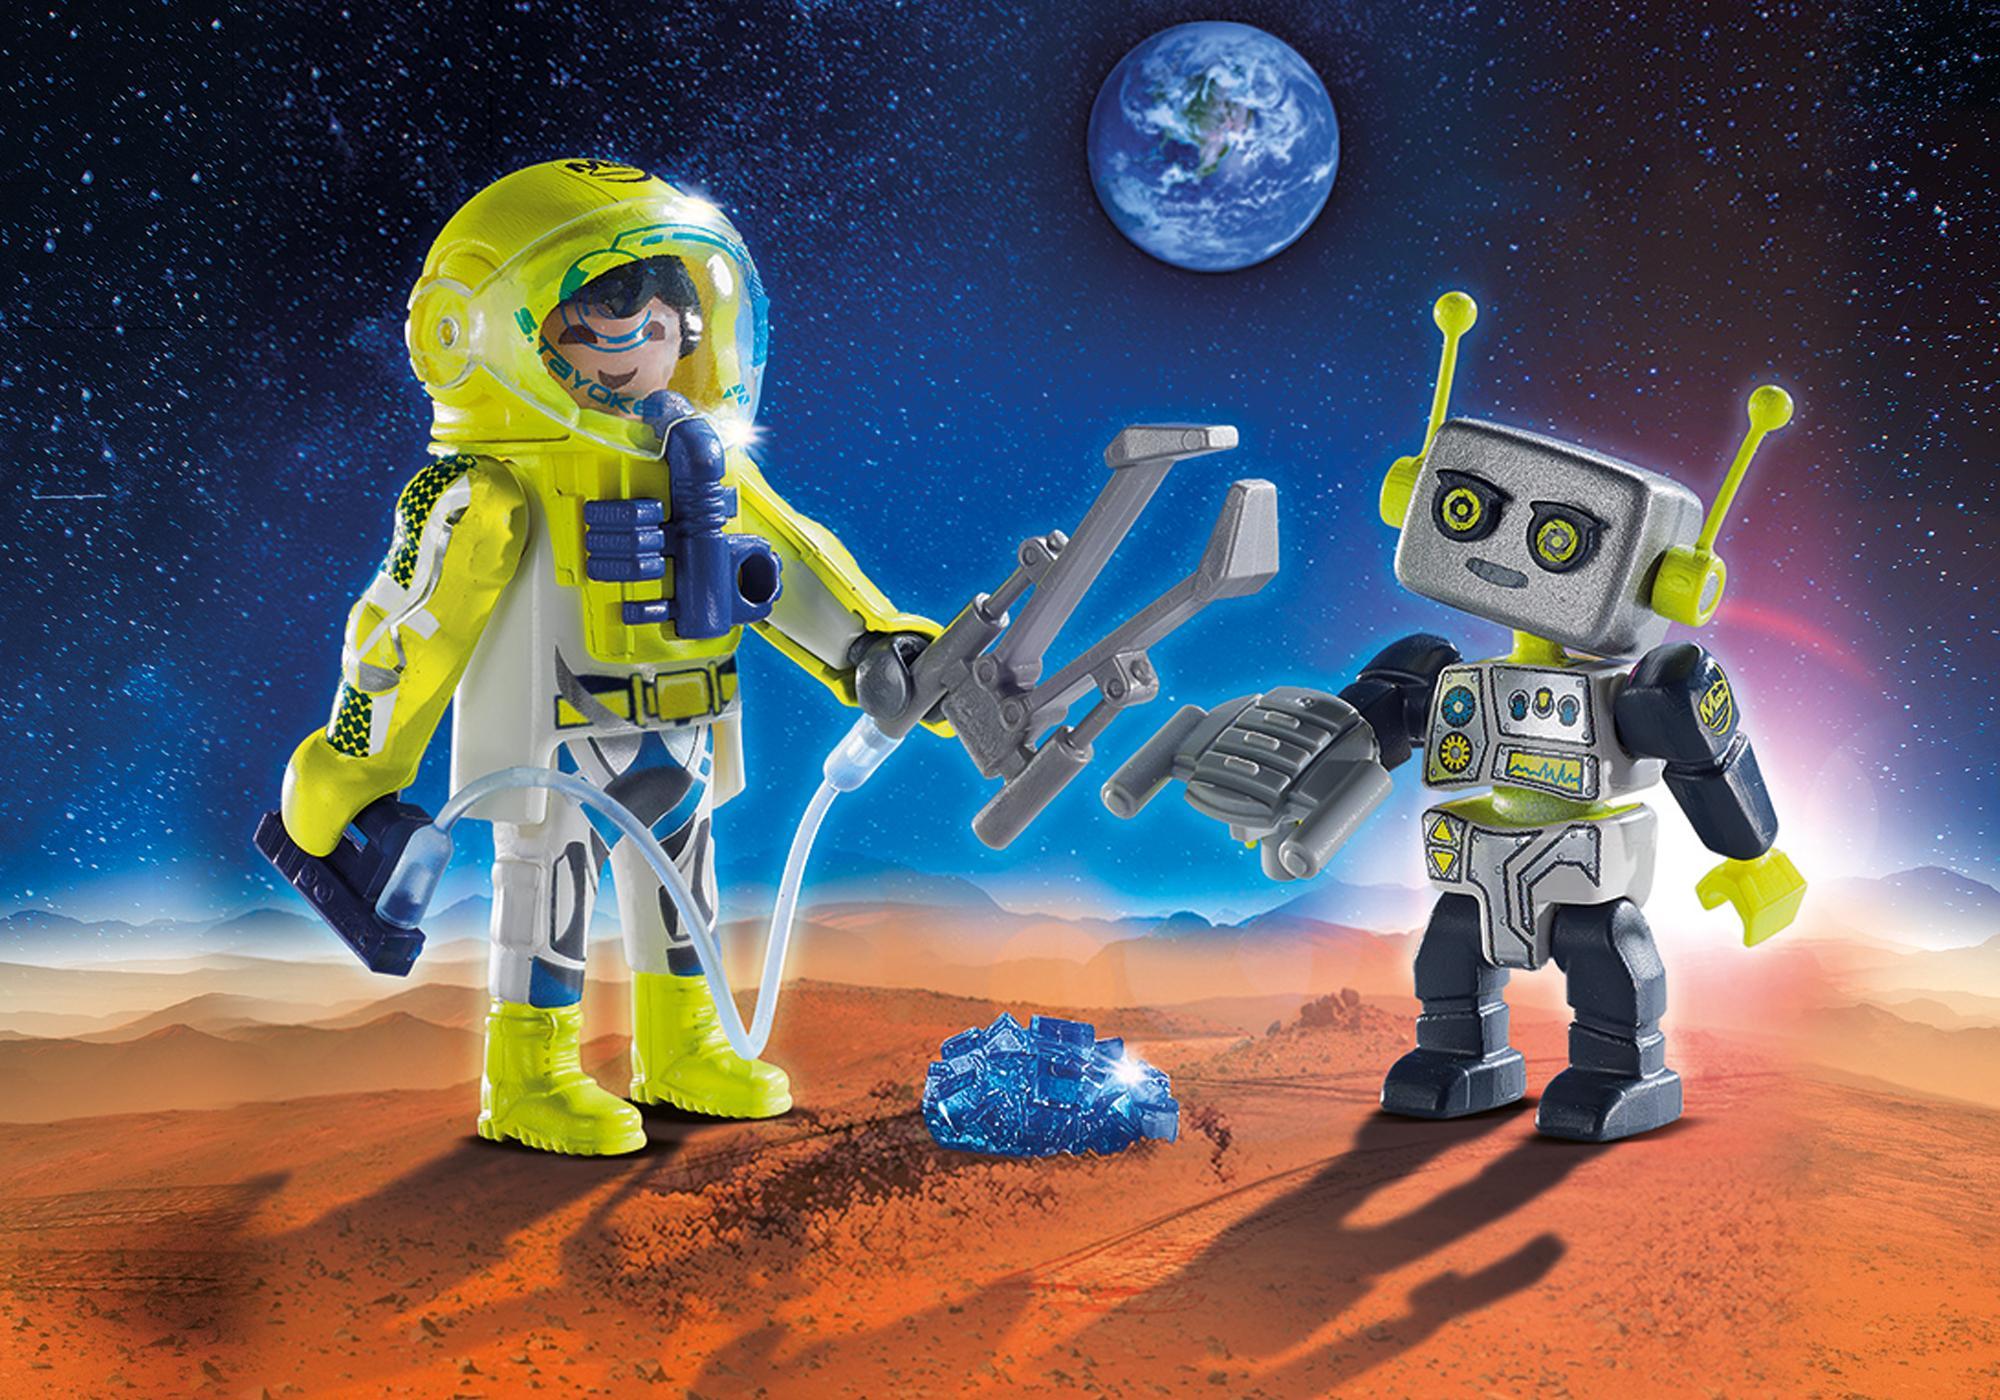 9492_product_detail/Duo Pack Αστροναύτης και ρομπότ